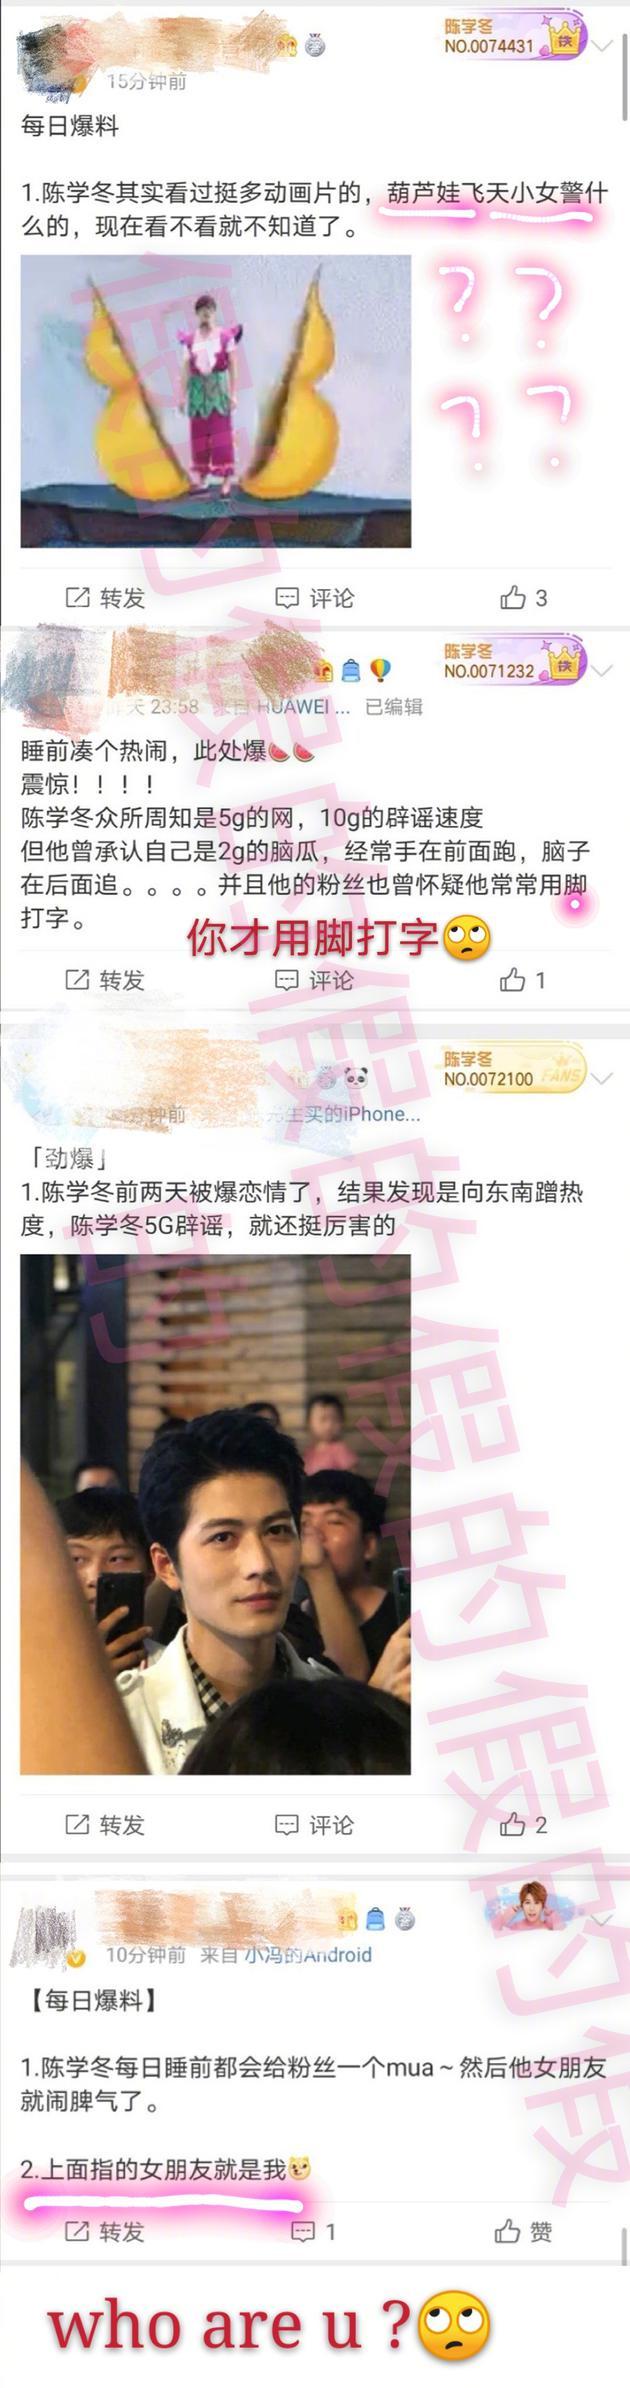 "5G冲浪达人!陈学冬发文""警告""粉丝不要爆料"